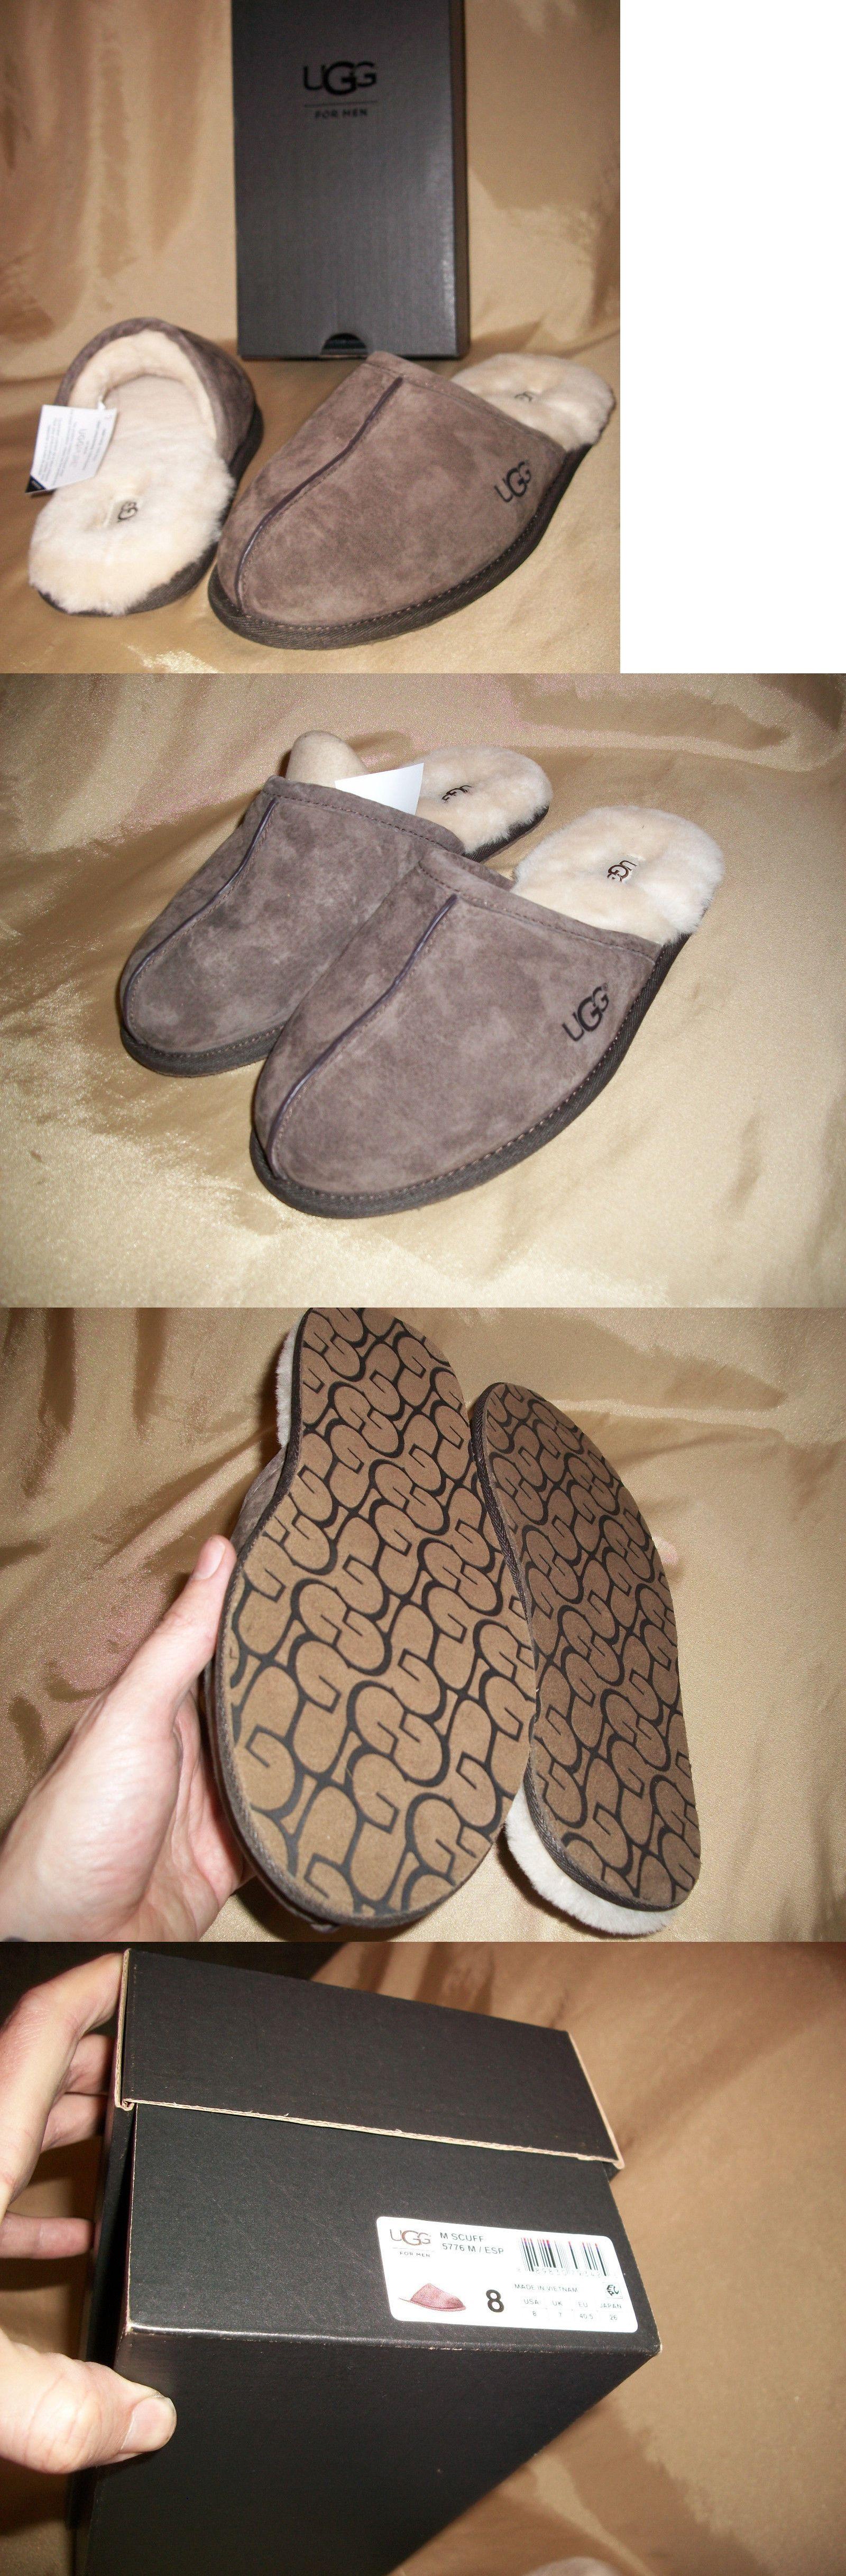 4696864a1c8 Slippers 11505: New! Size 8 Ugg Aust. Sheepskin-Suede Mens Scuff ...